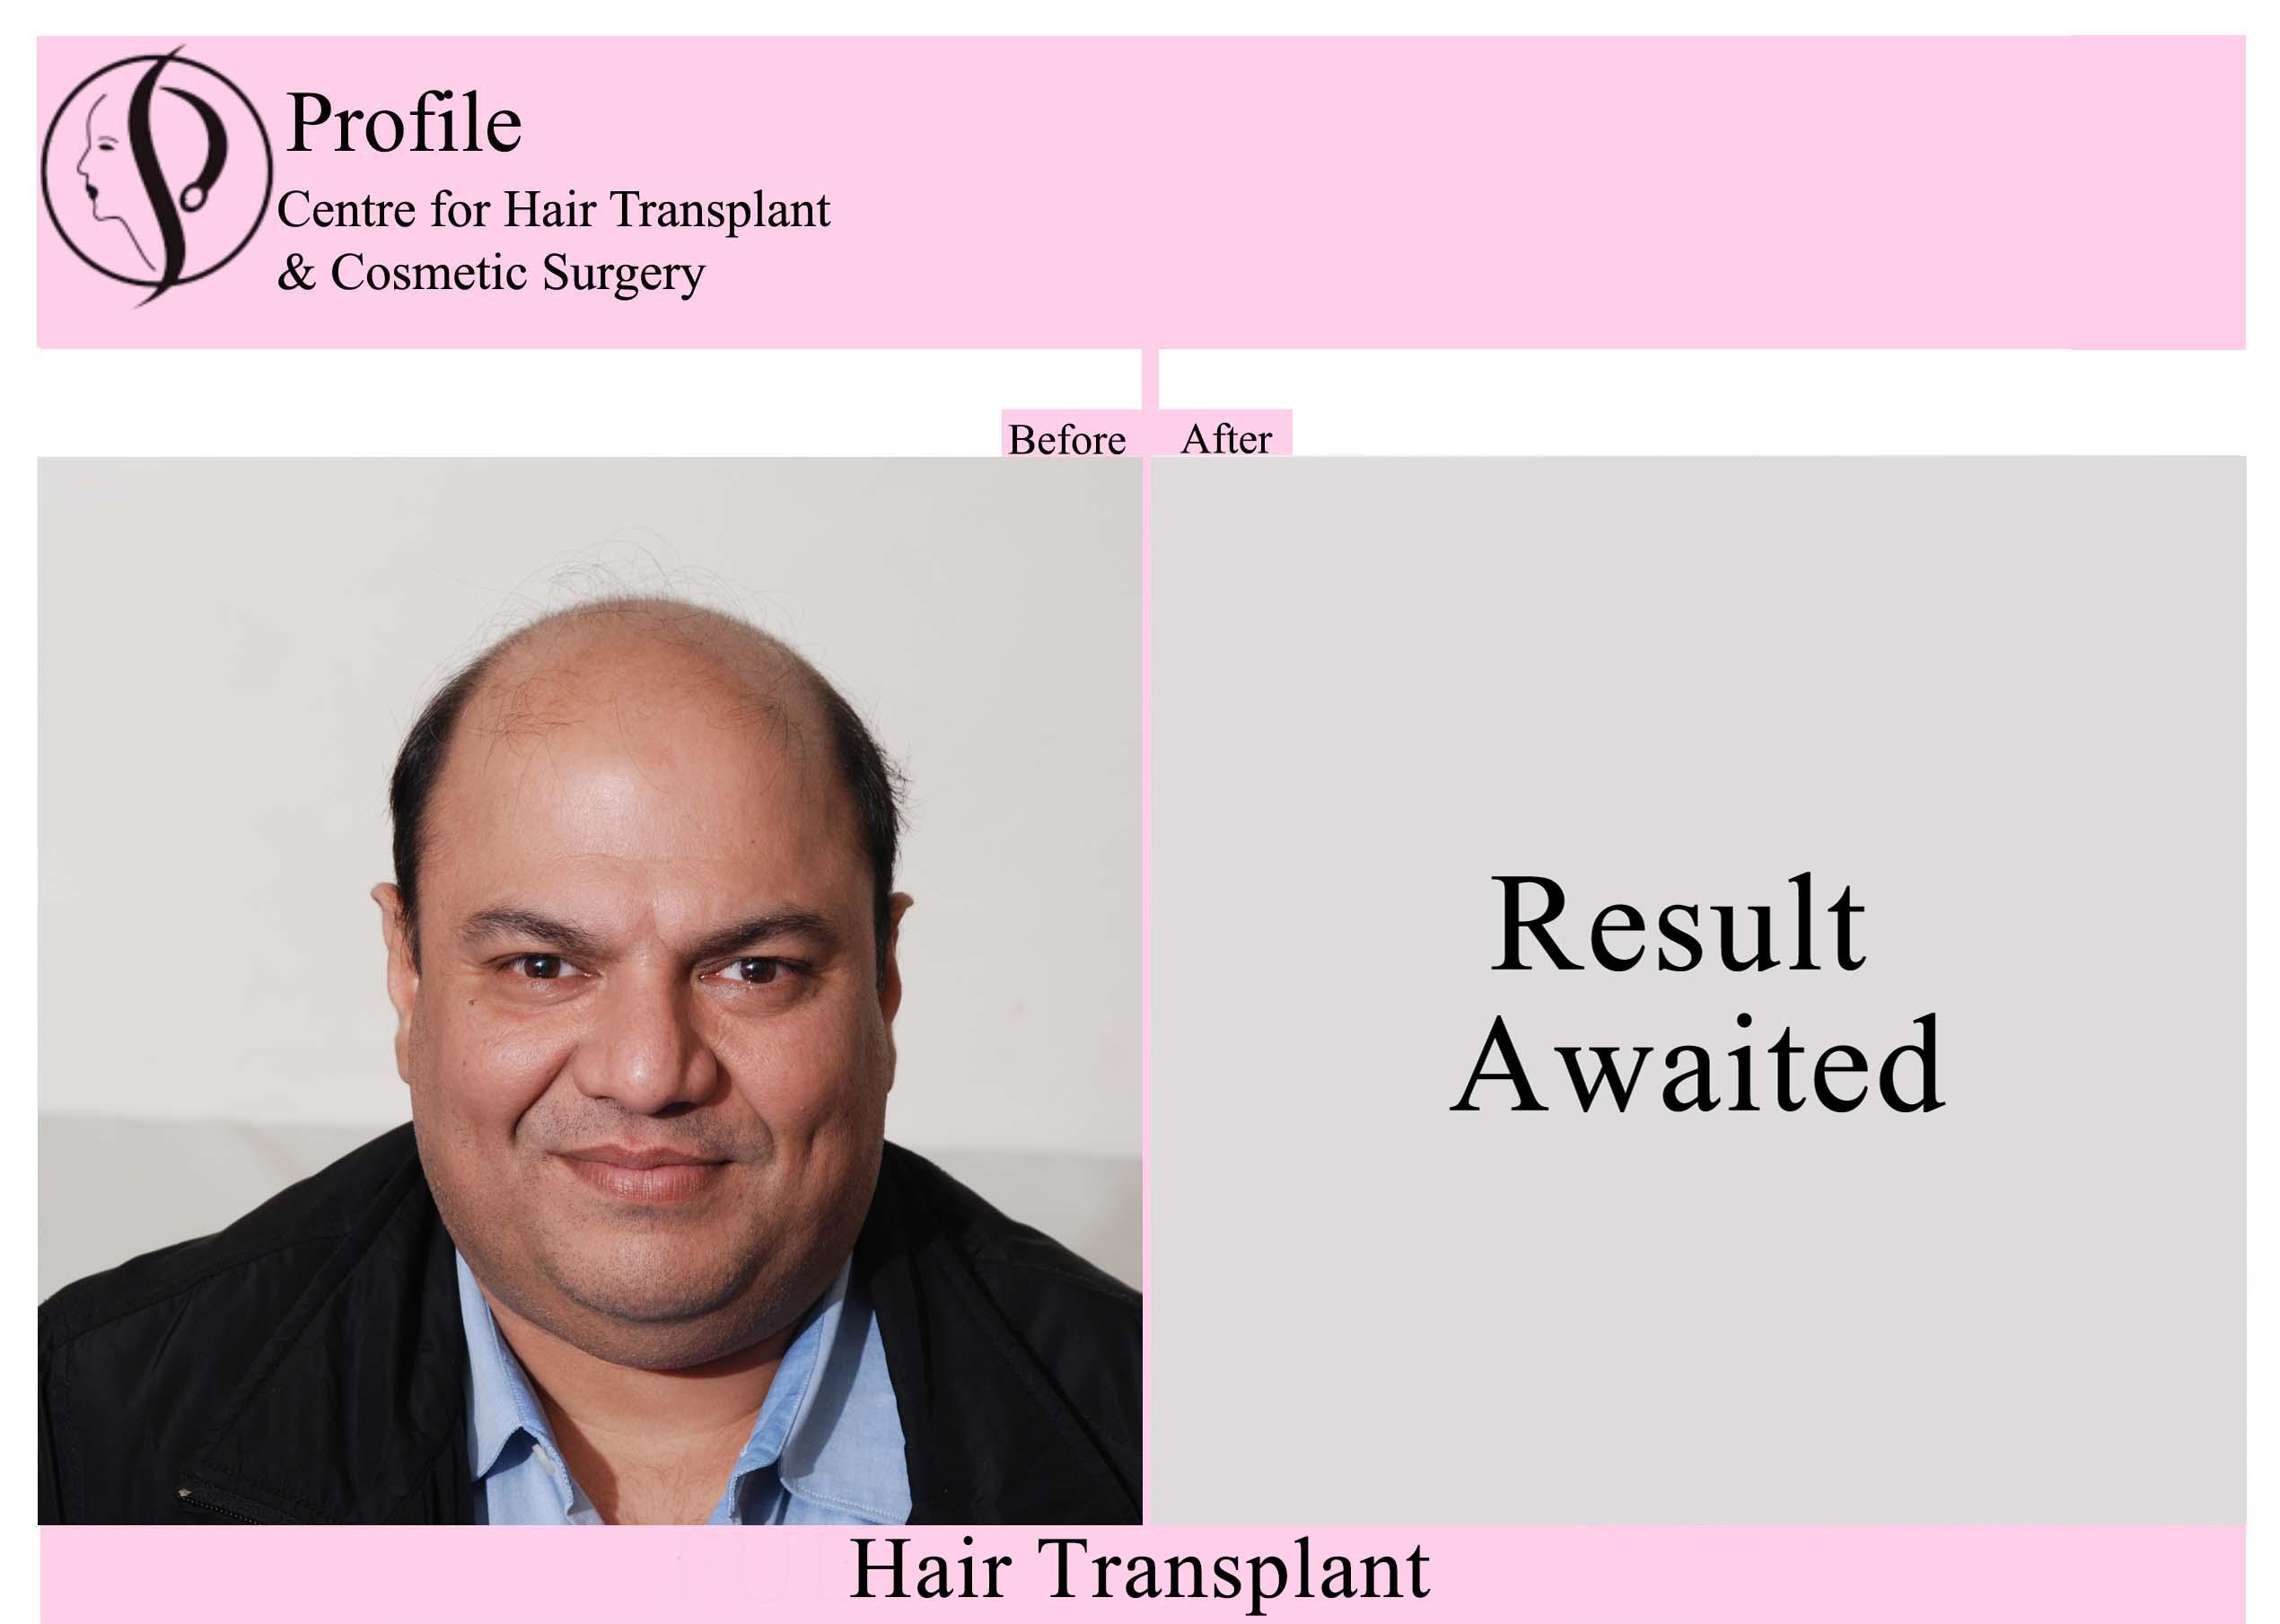 Dr. Rupesh Chaudhry